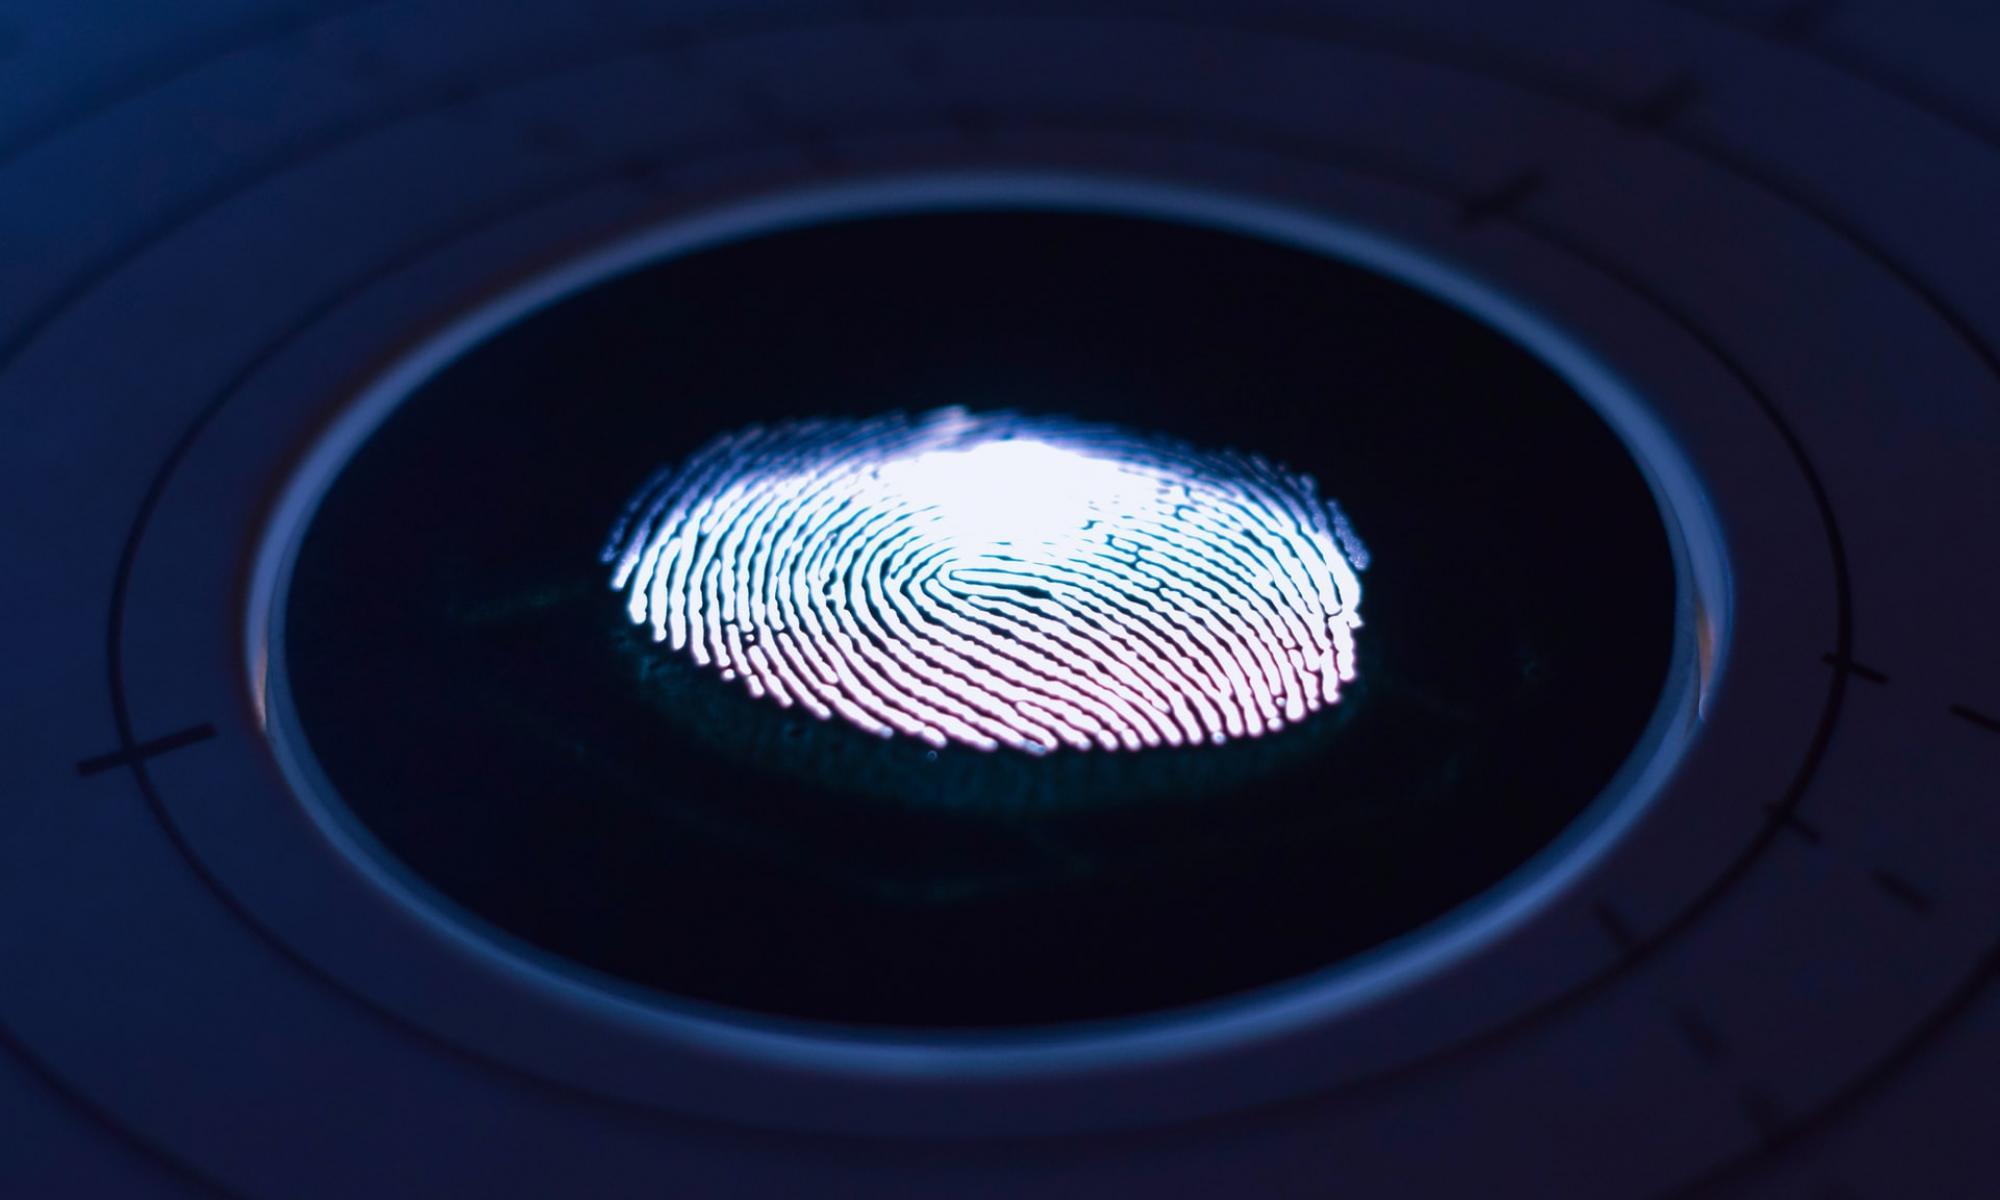 Finger print illuminated under blue light